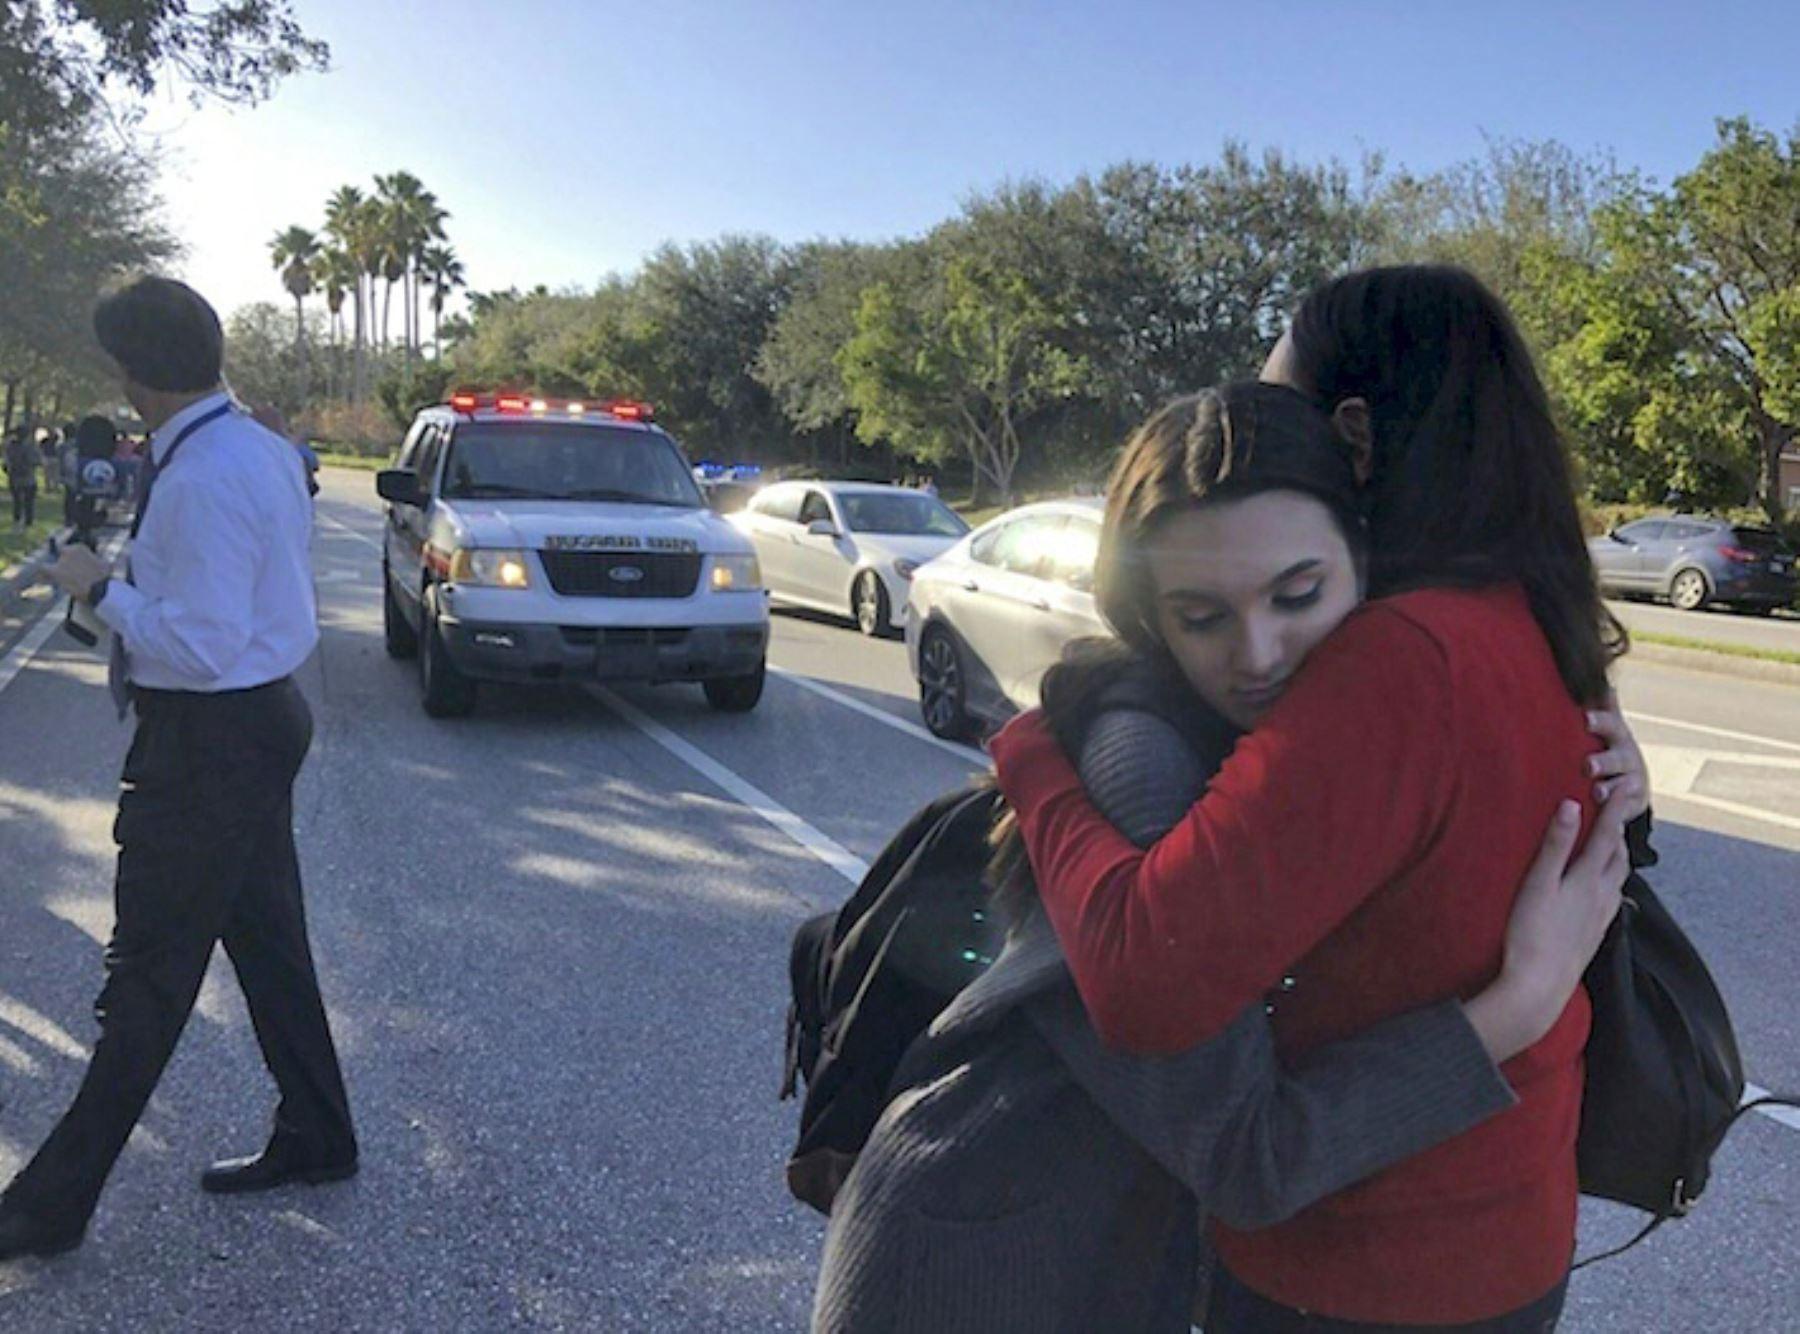 Tiroteo en escuela de Florida. Foto: AFP.